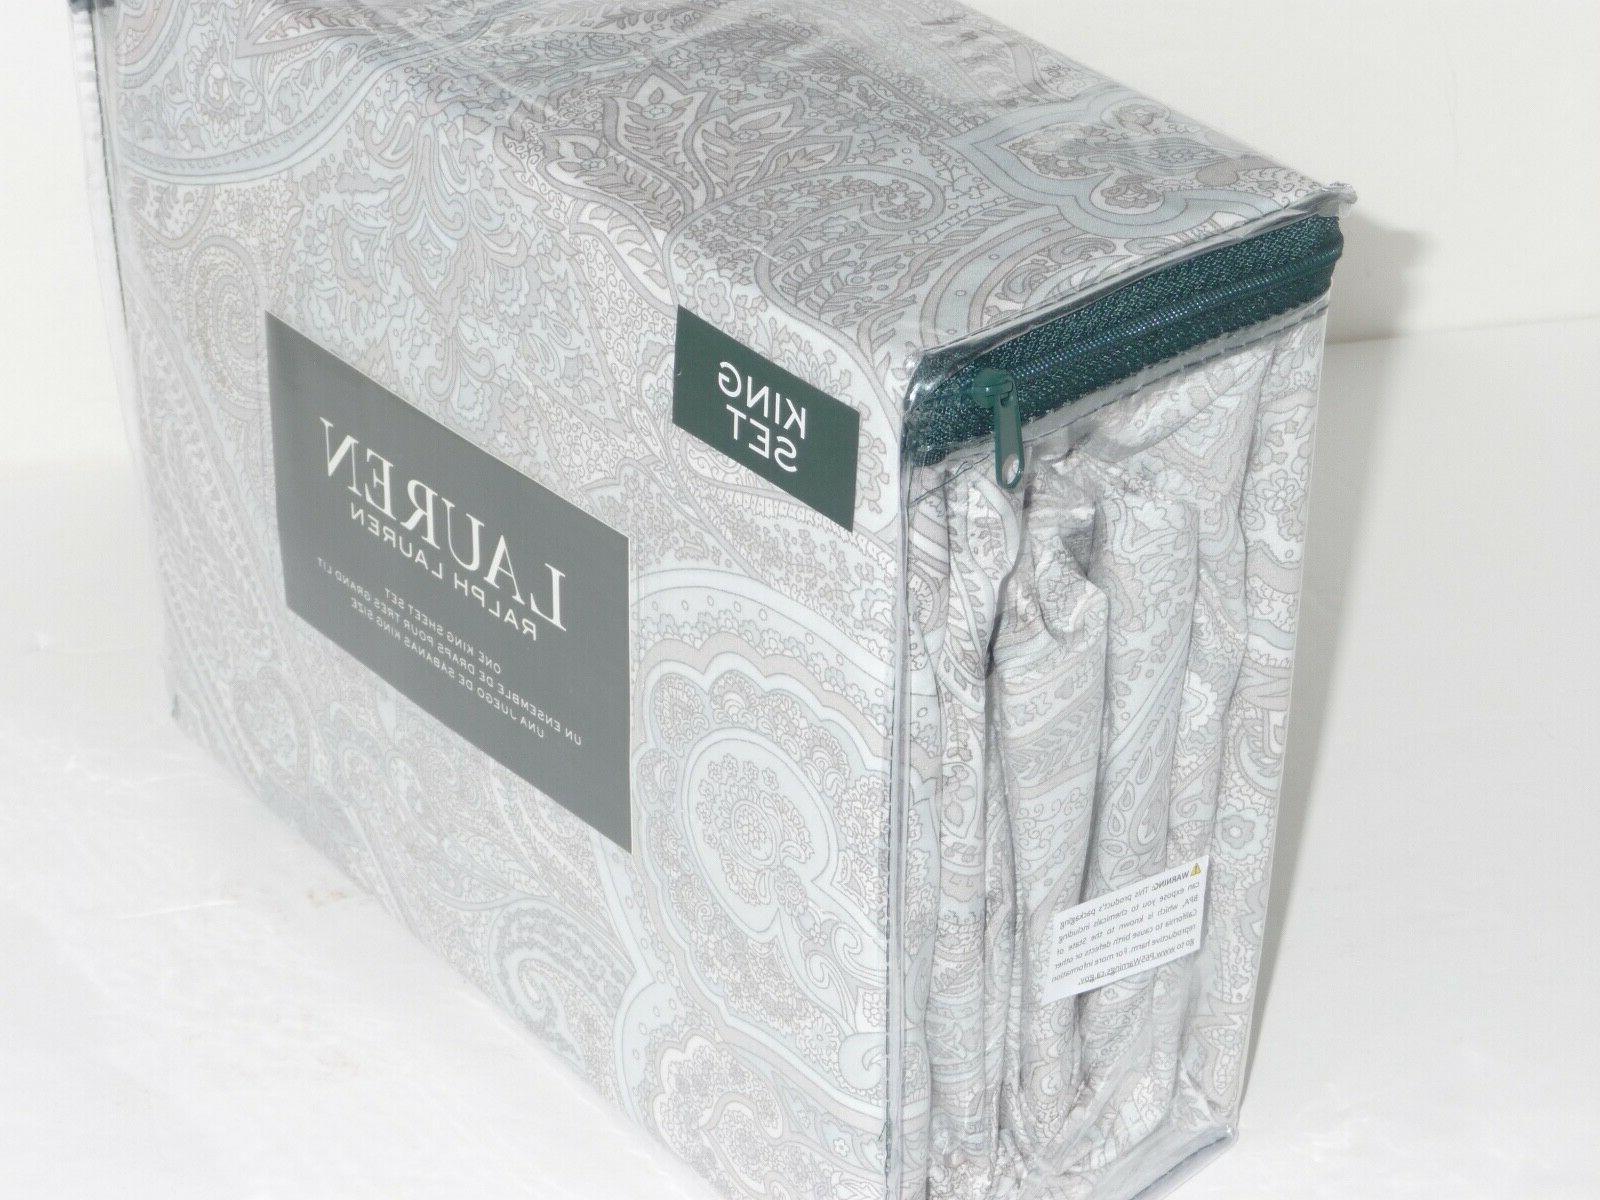 Ralph Lauren PAISLEY KING SHEET GRAY WHITE NEW